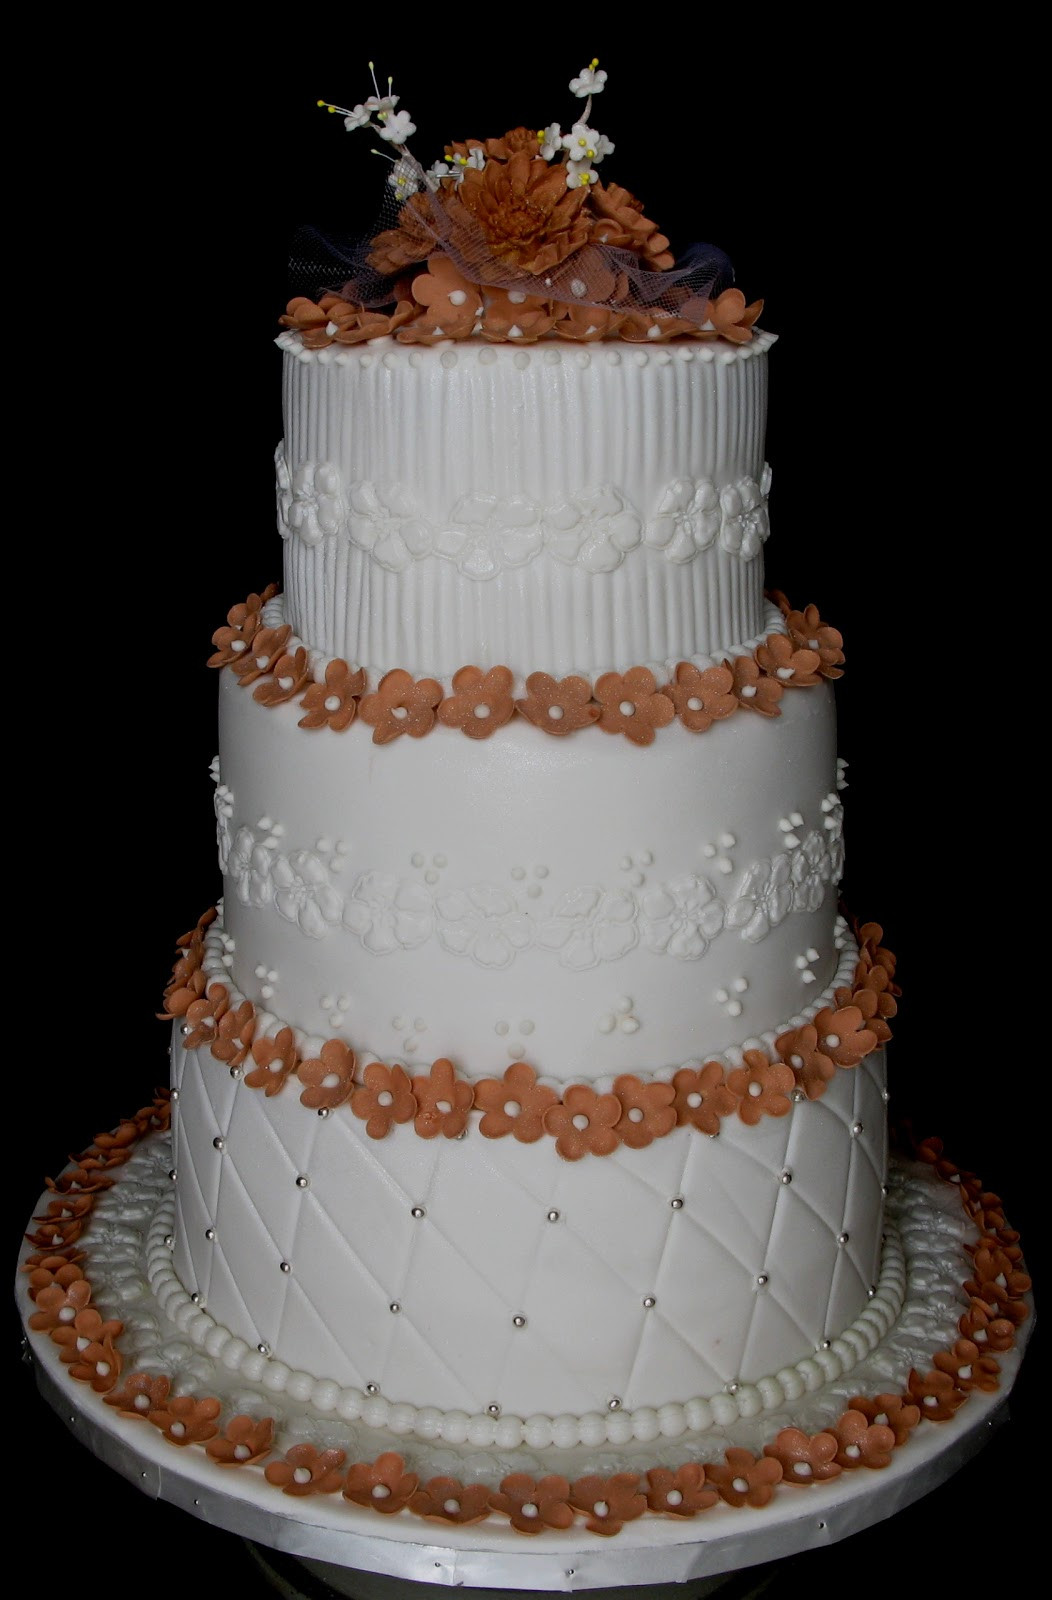 2 Layers Wedding Cakes  3 layered wedding cake idea in 2017